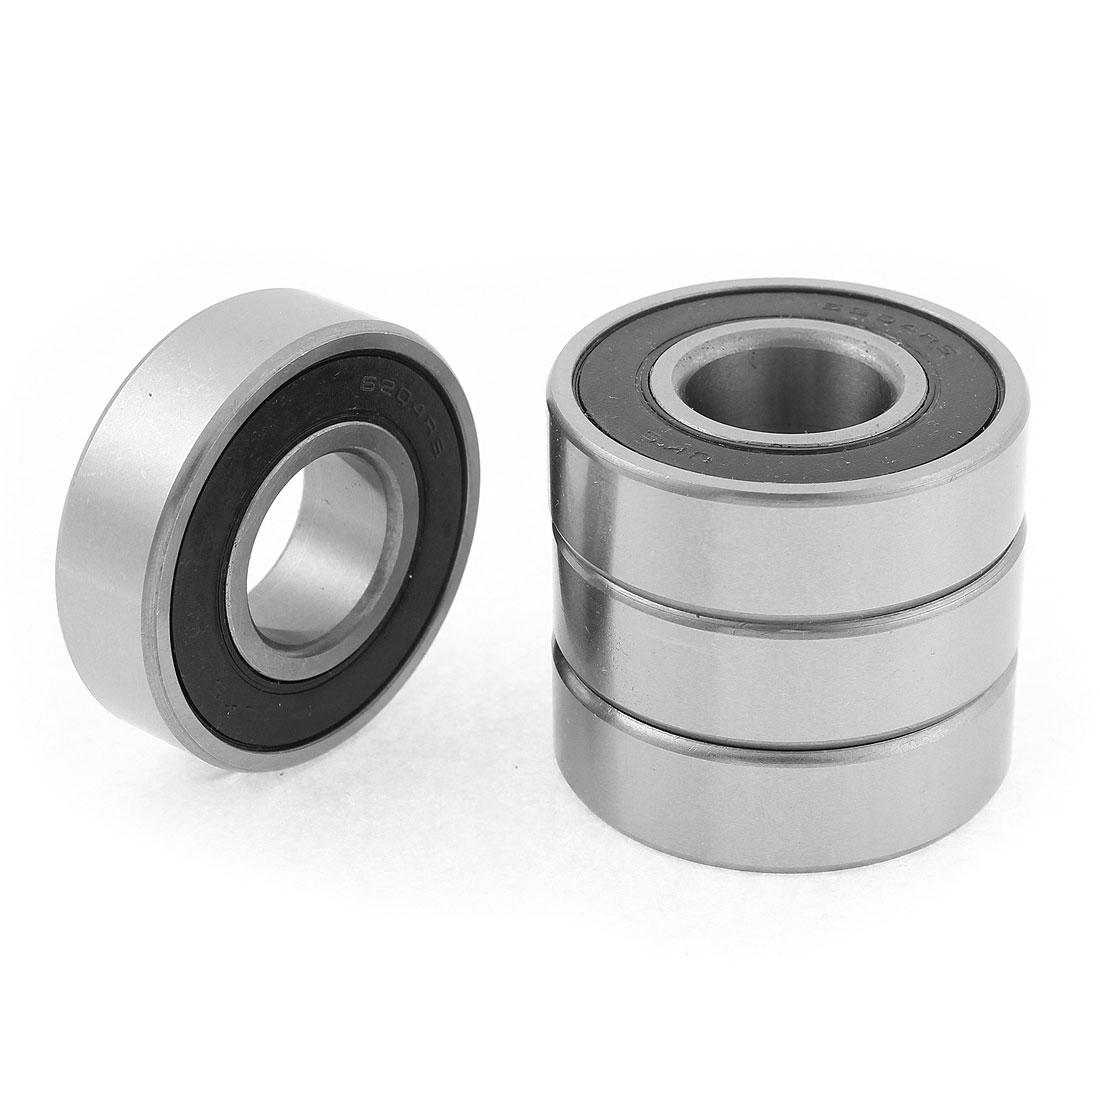 6204RS Rubber Shielded Deep Groove Ball Bearing 20mm x 47mm x 14mm 4pcs